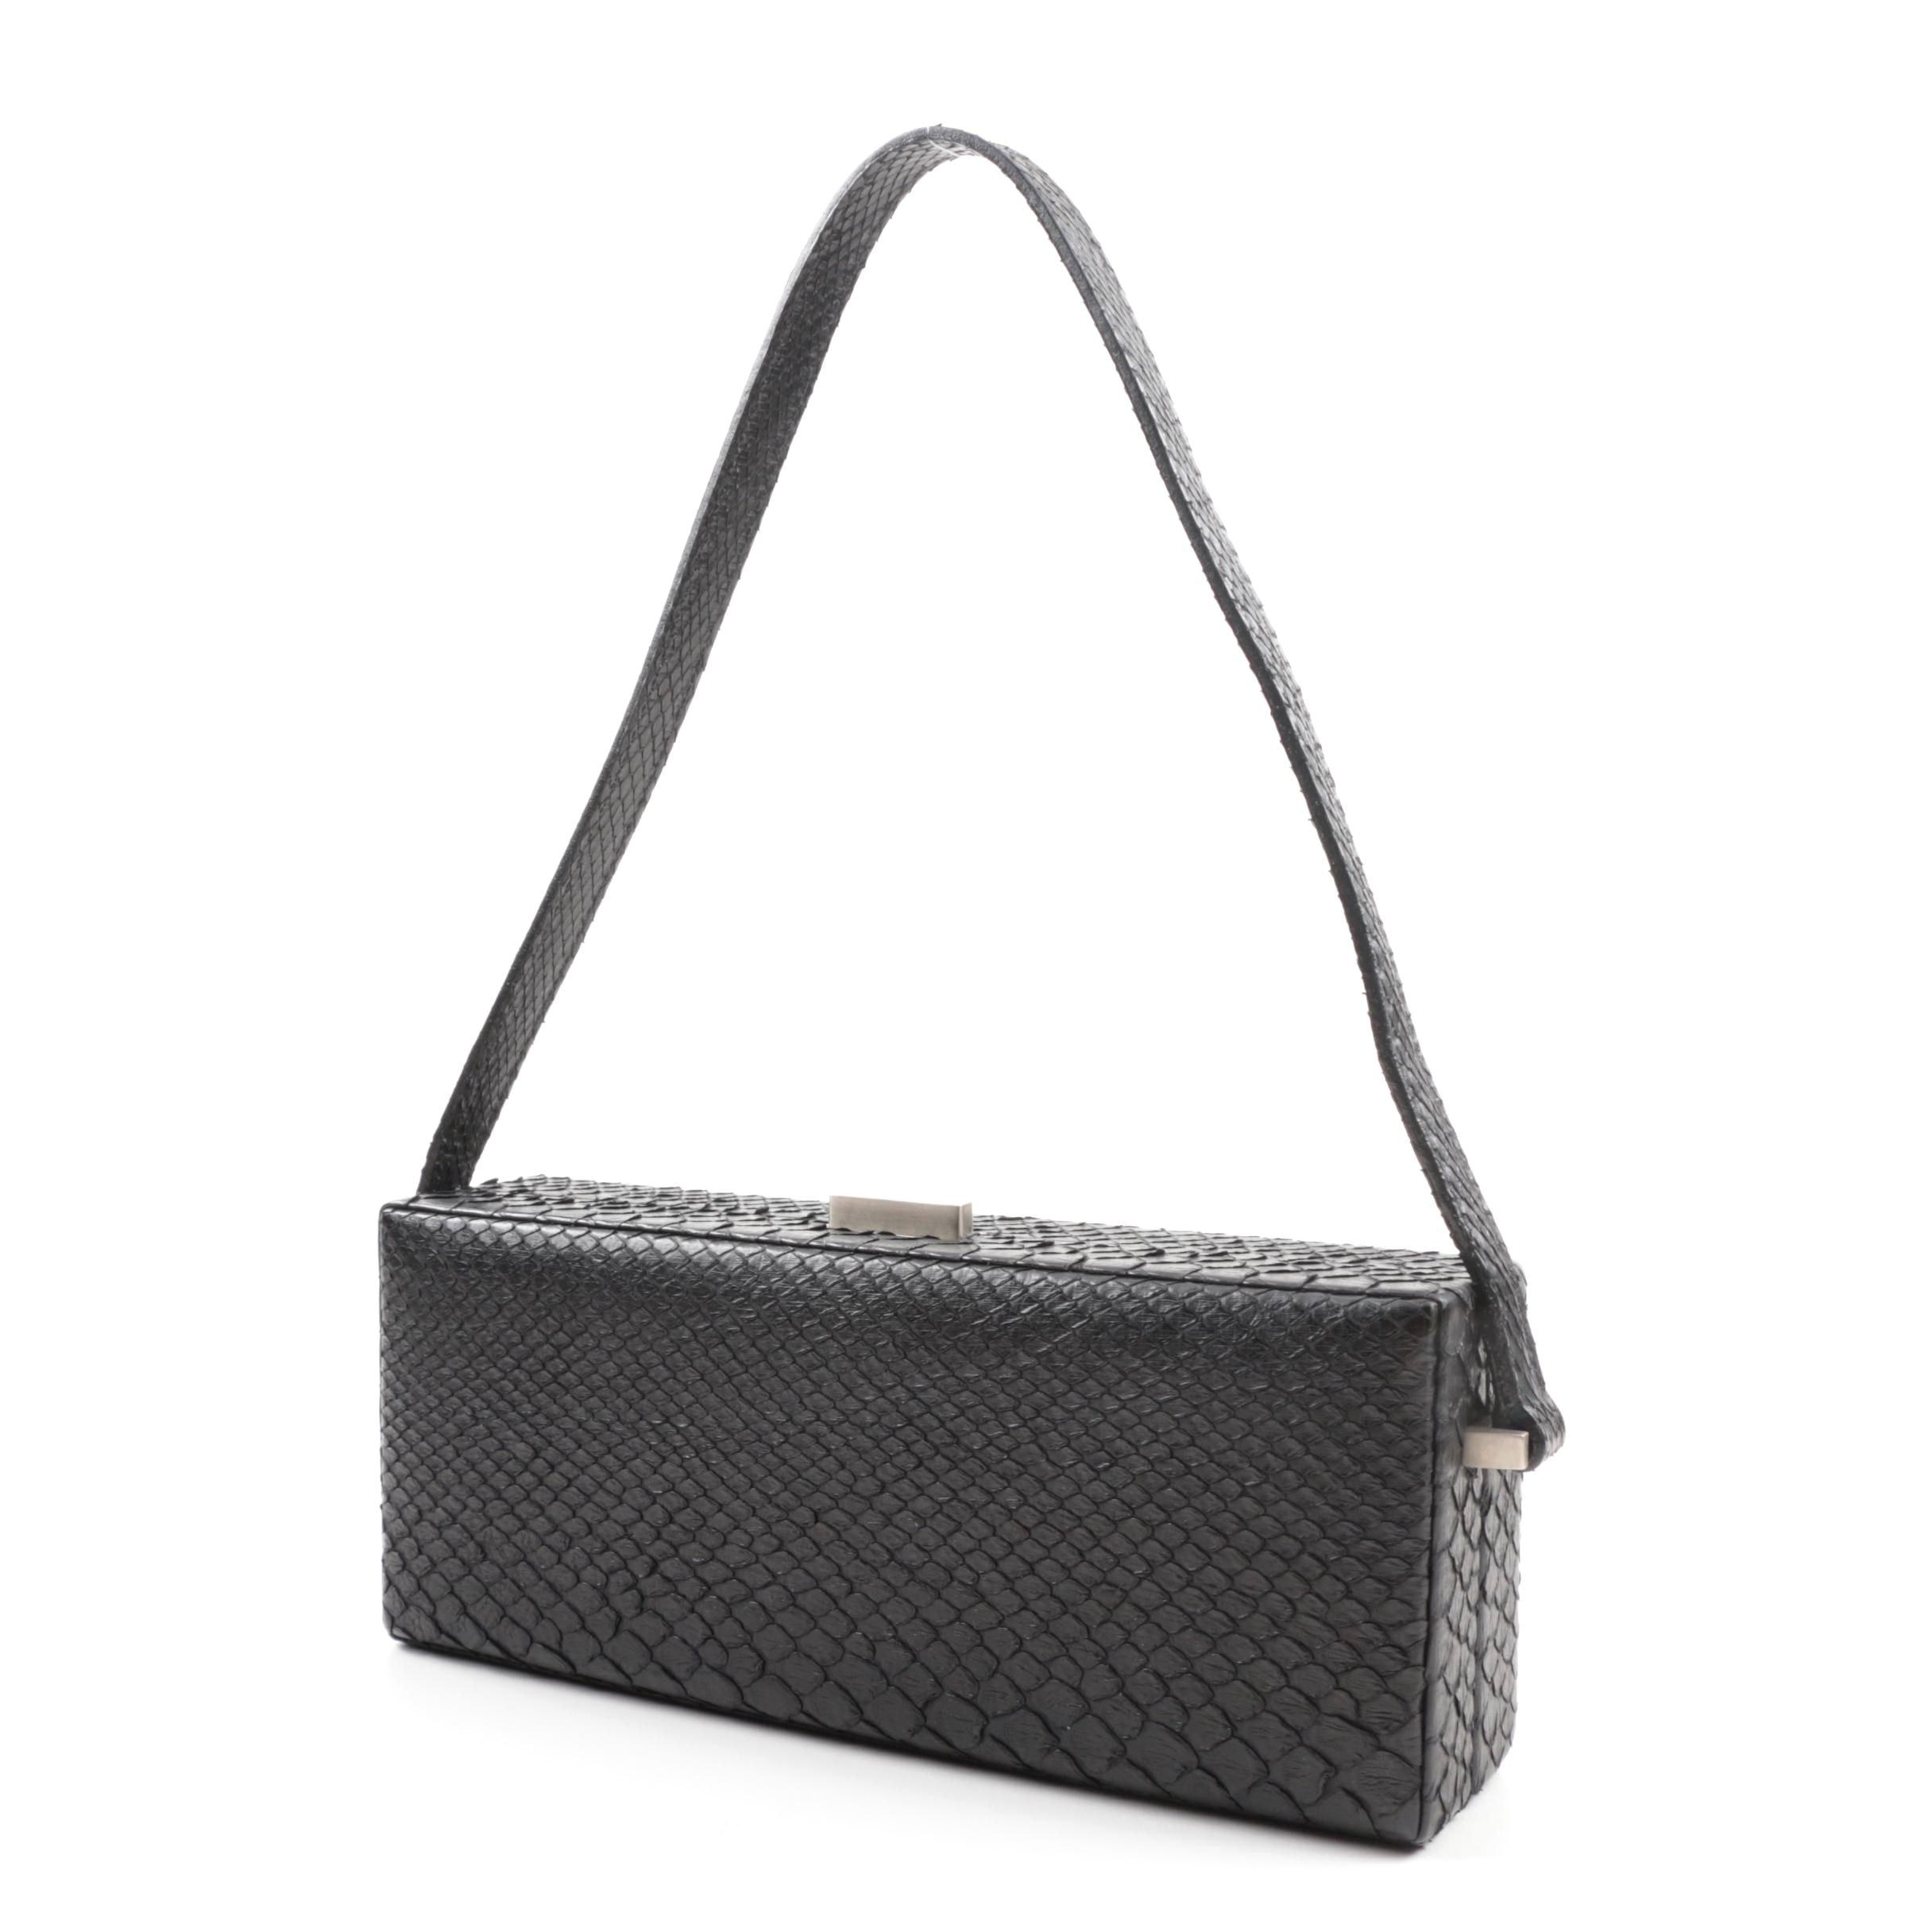 Boxy Calvin Klein Black Snakeskin Handbag